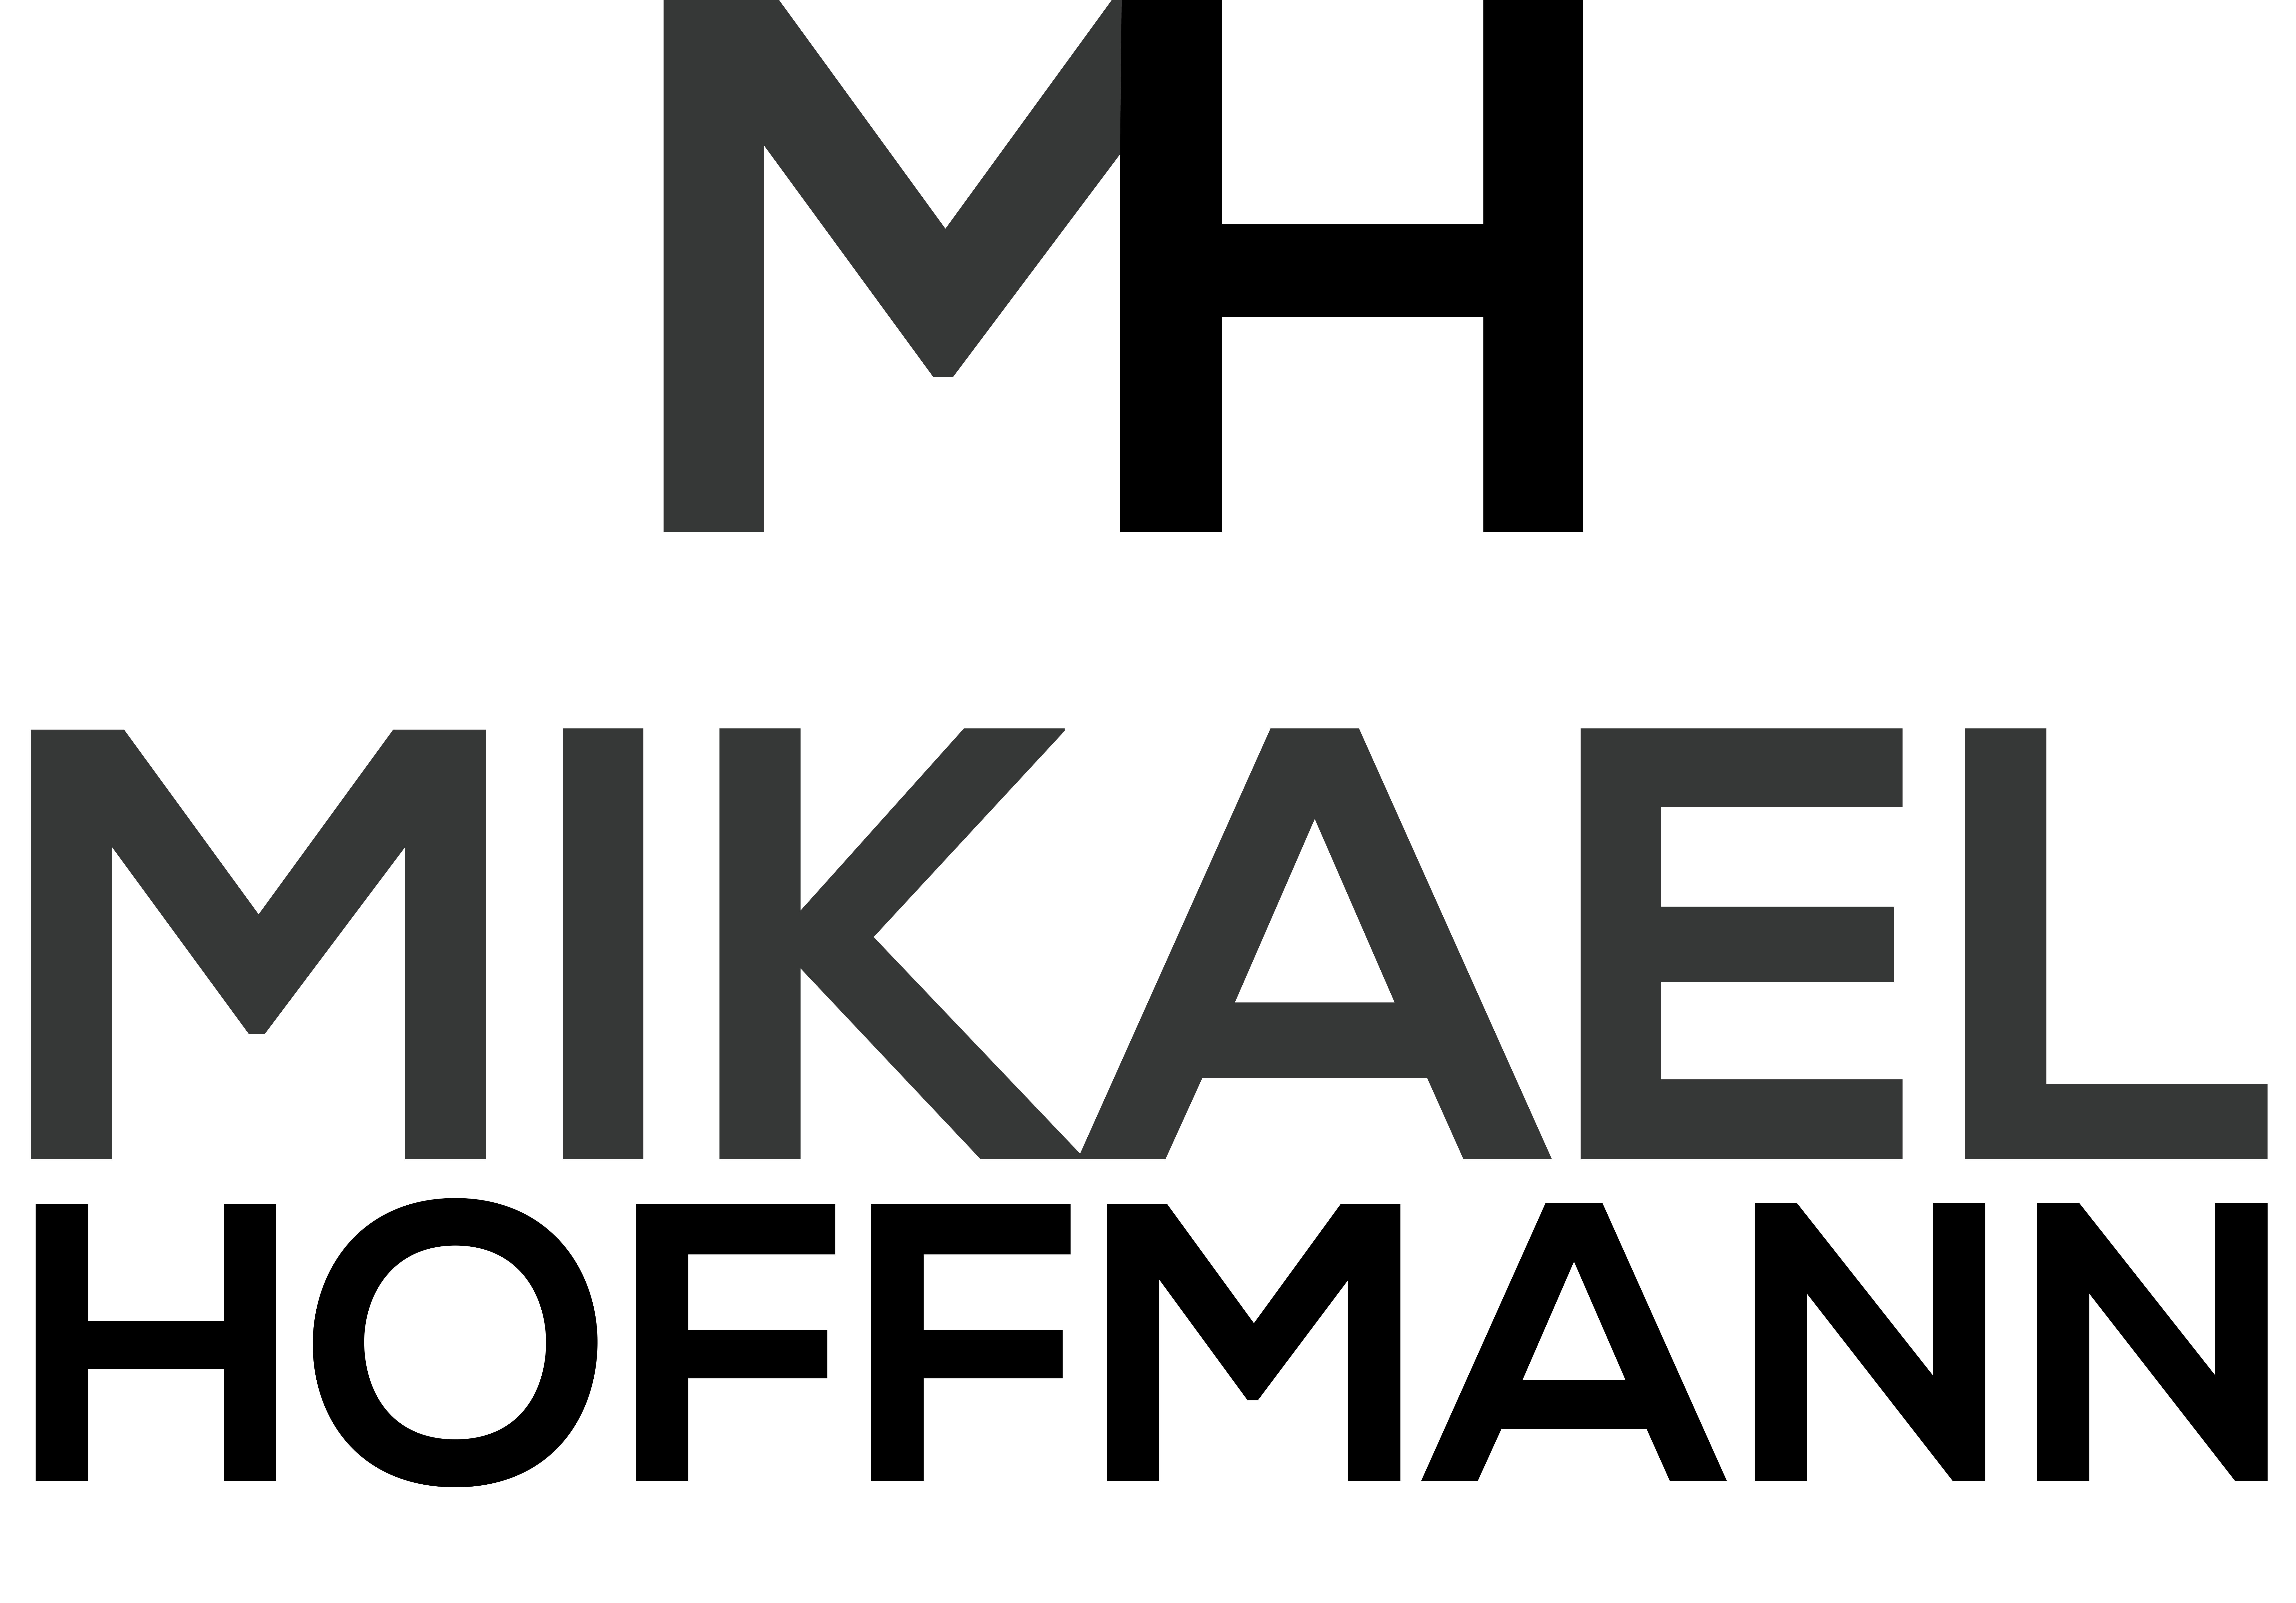 Mikael_Hoffmann (1)